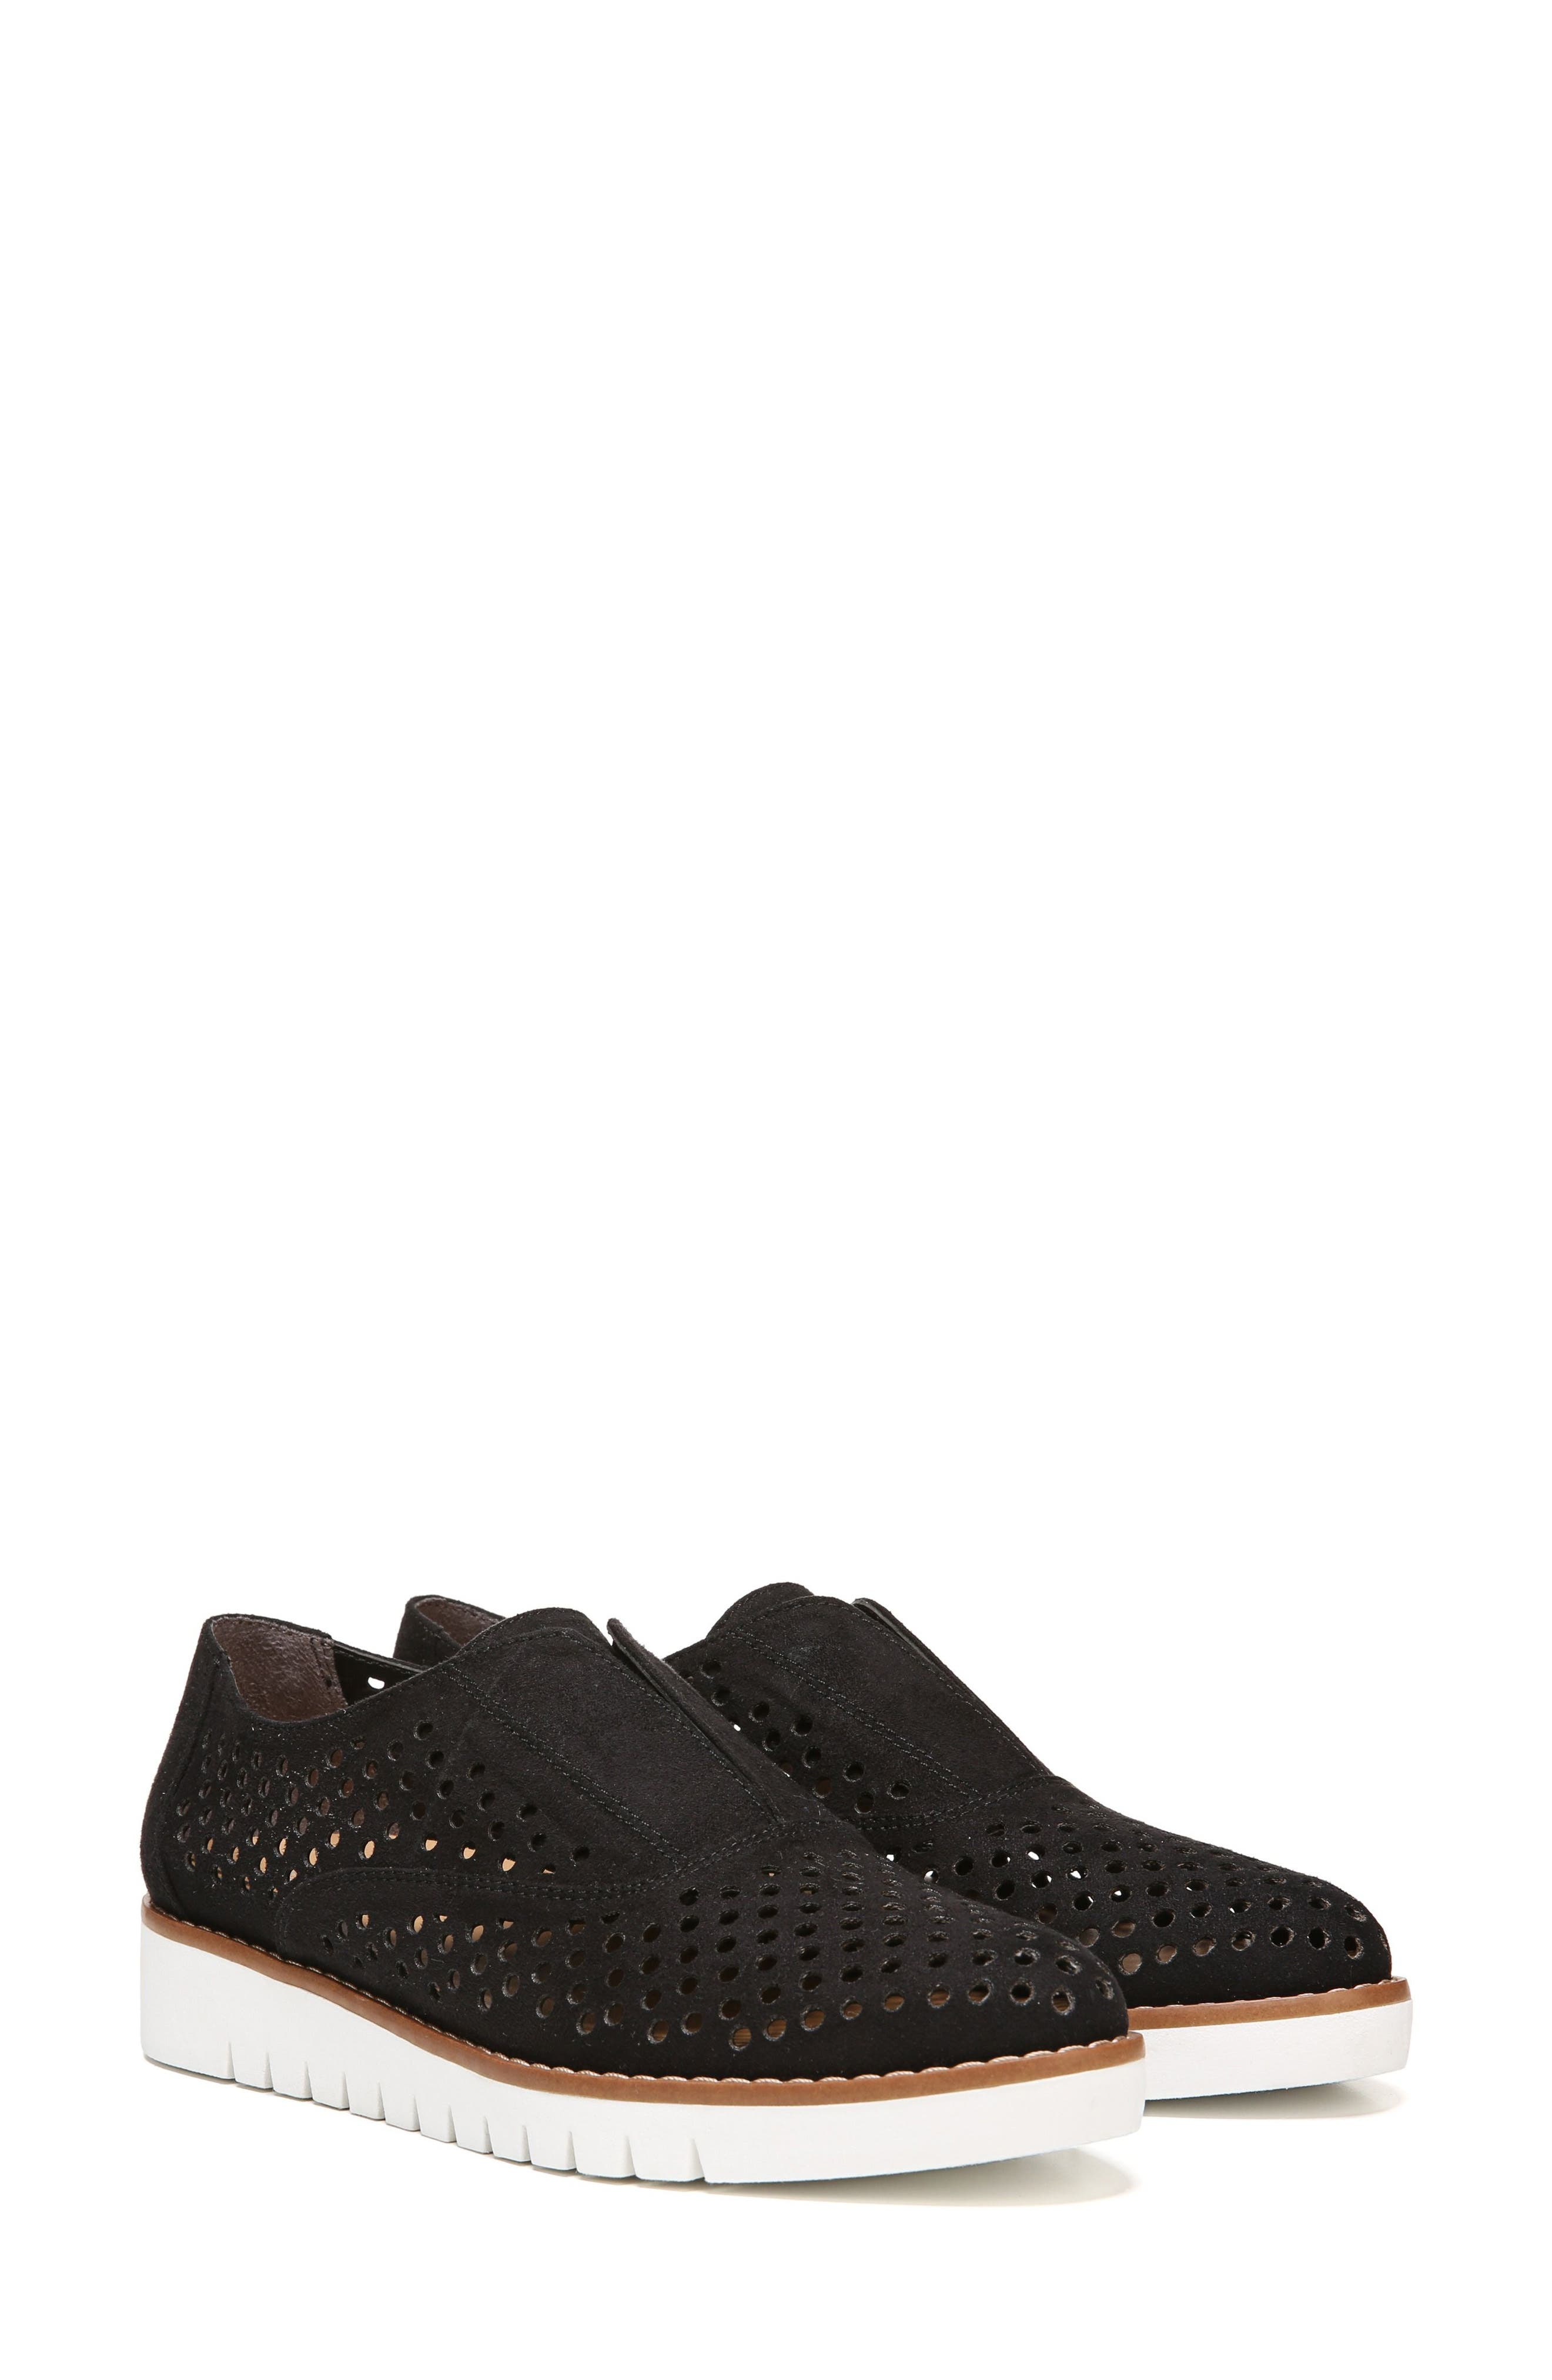 Improve Slip-On Sneaker,                             Alternate thumbnail 8, color,                             Black Fabric